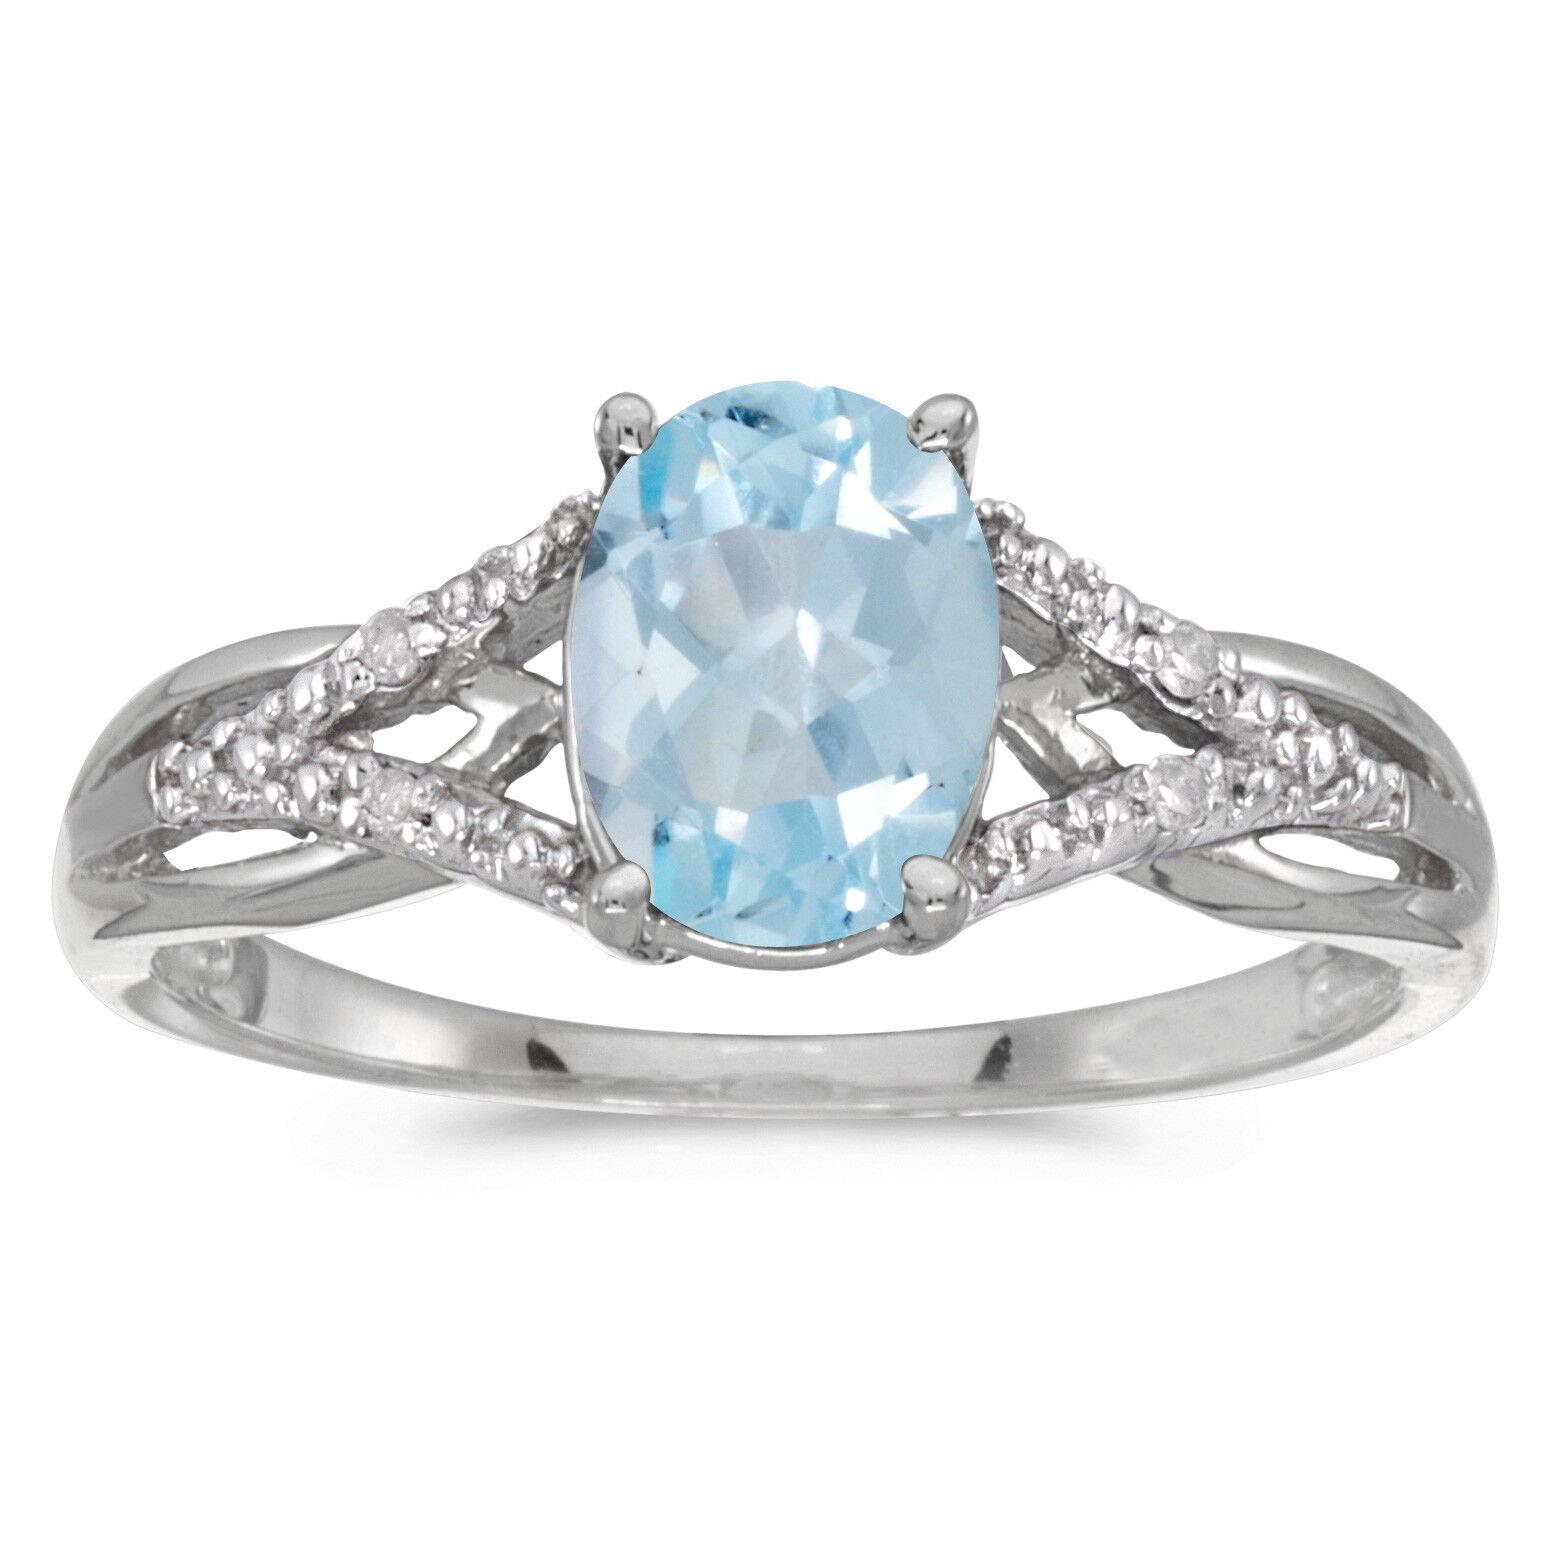 14k White gold Oval Aquamarine And Diamond Ring